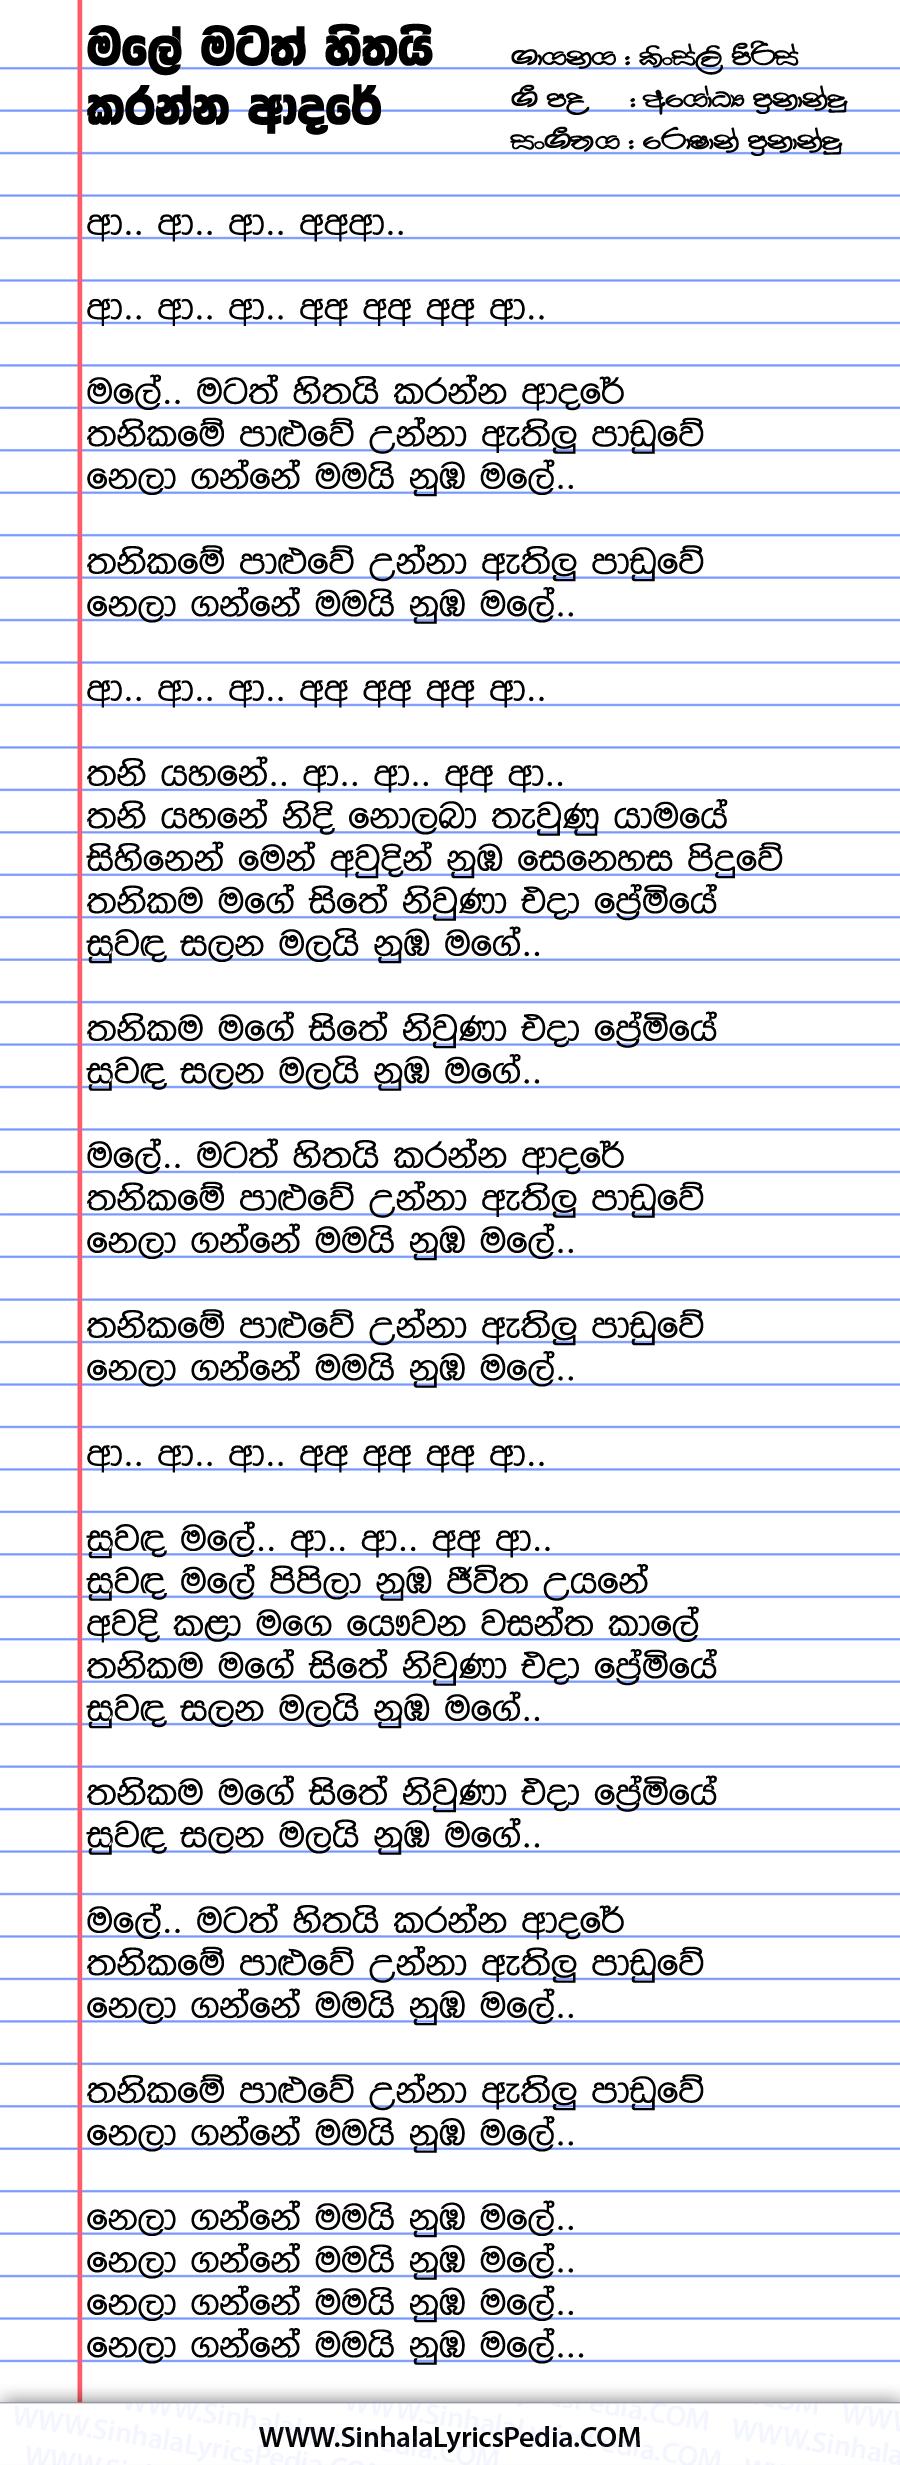 Male Matath Hithai Karanna Adare Song Lyrics